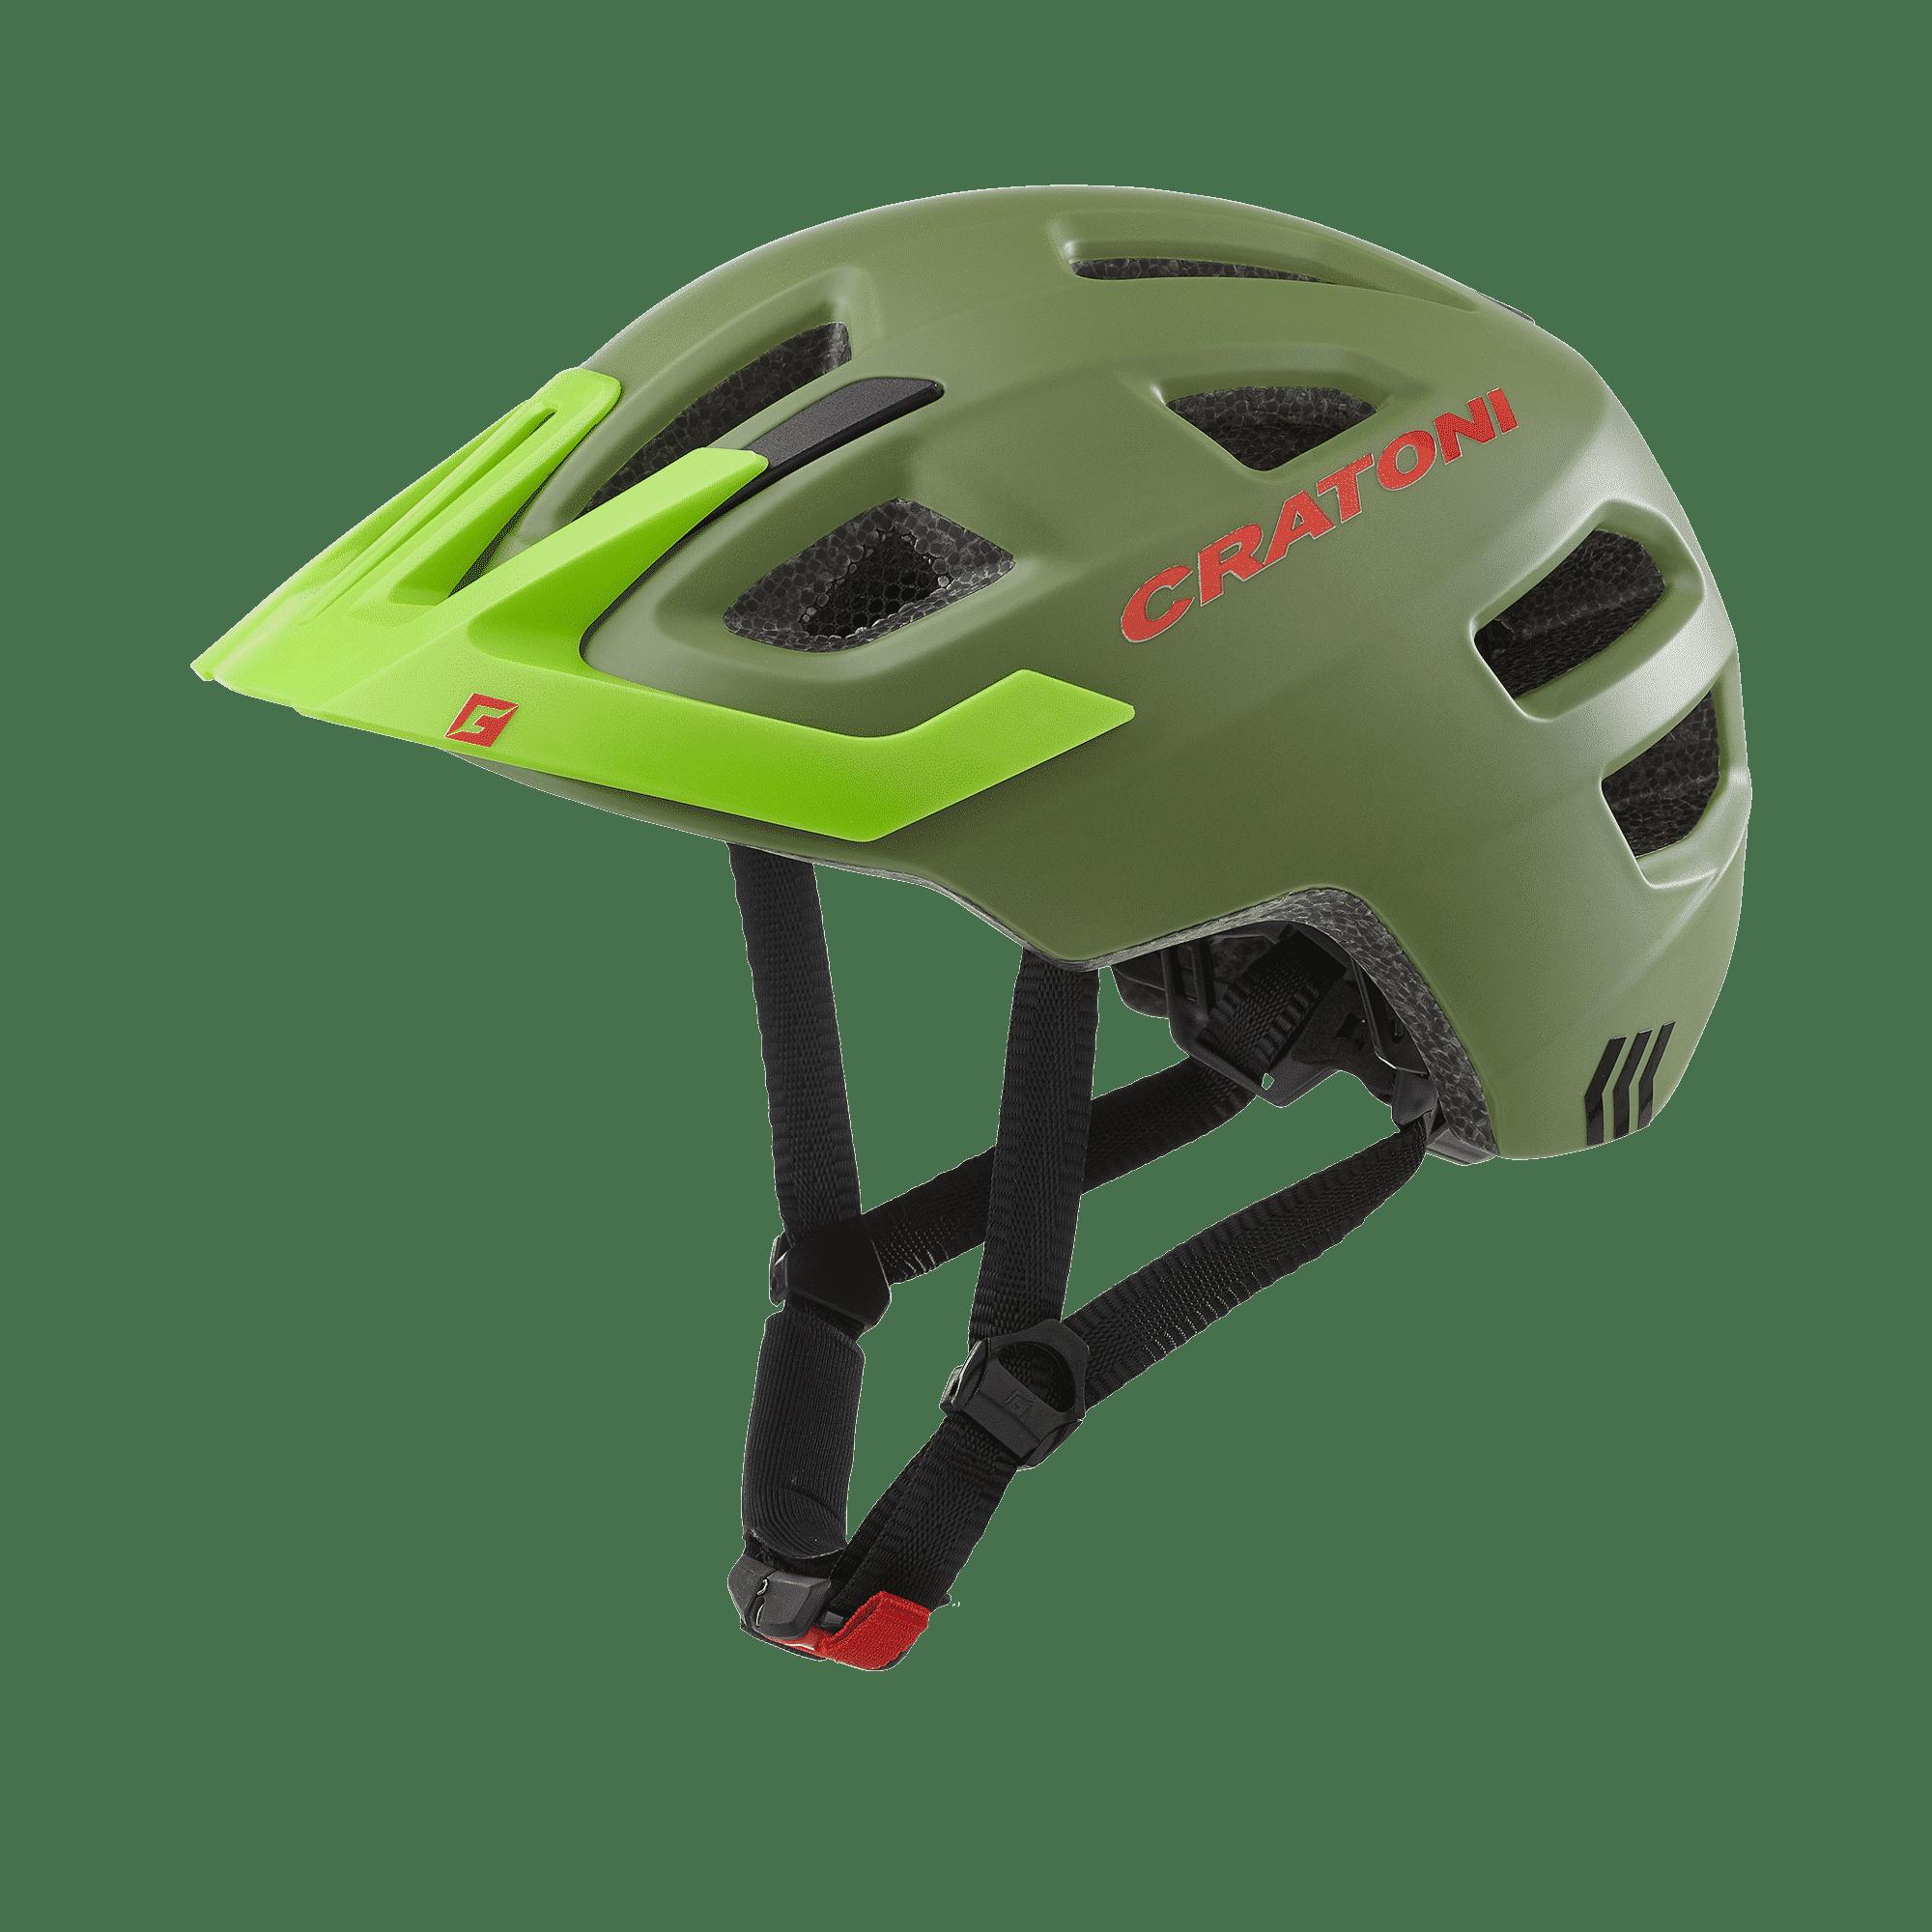 Maxster-Pro jungle green matt